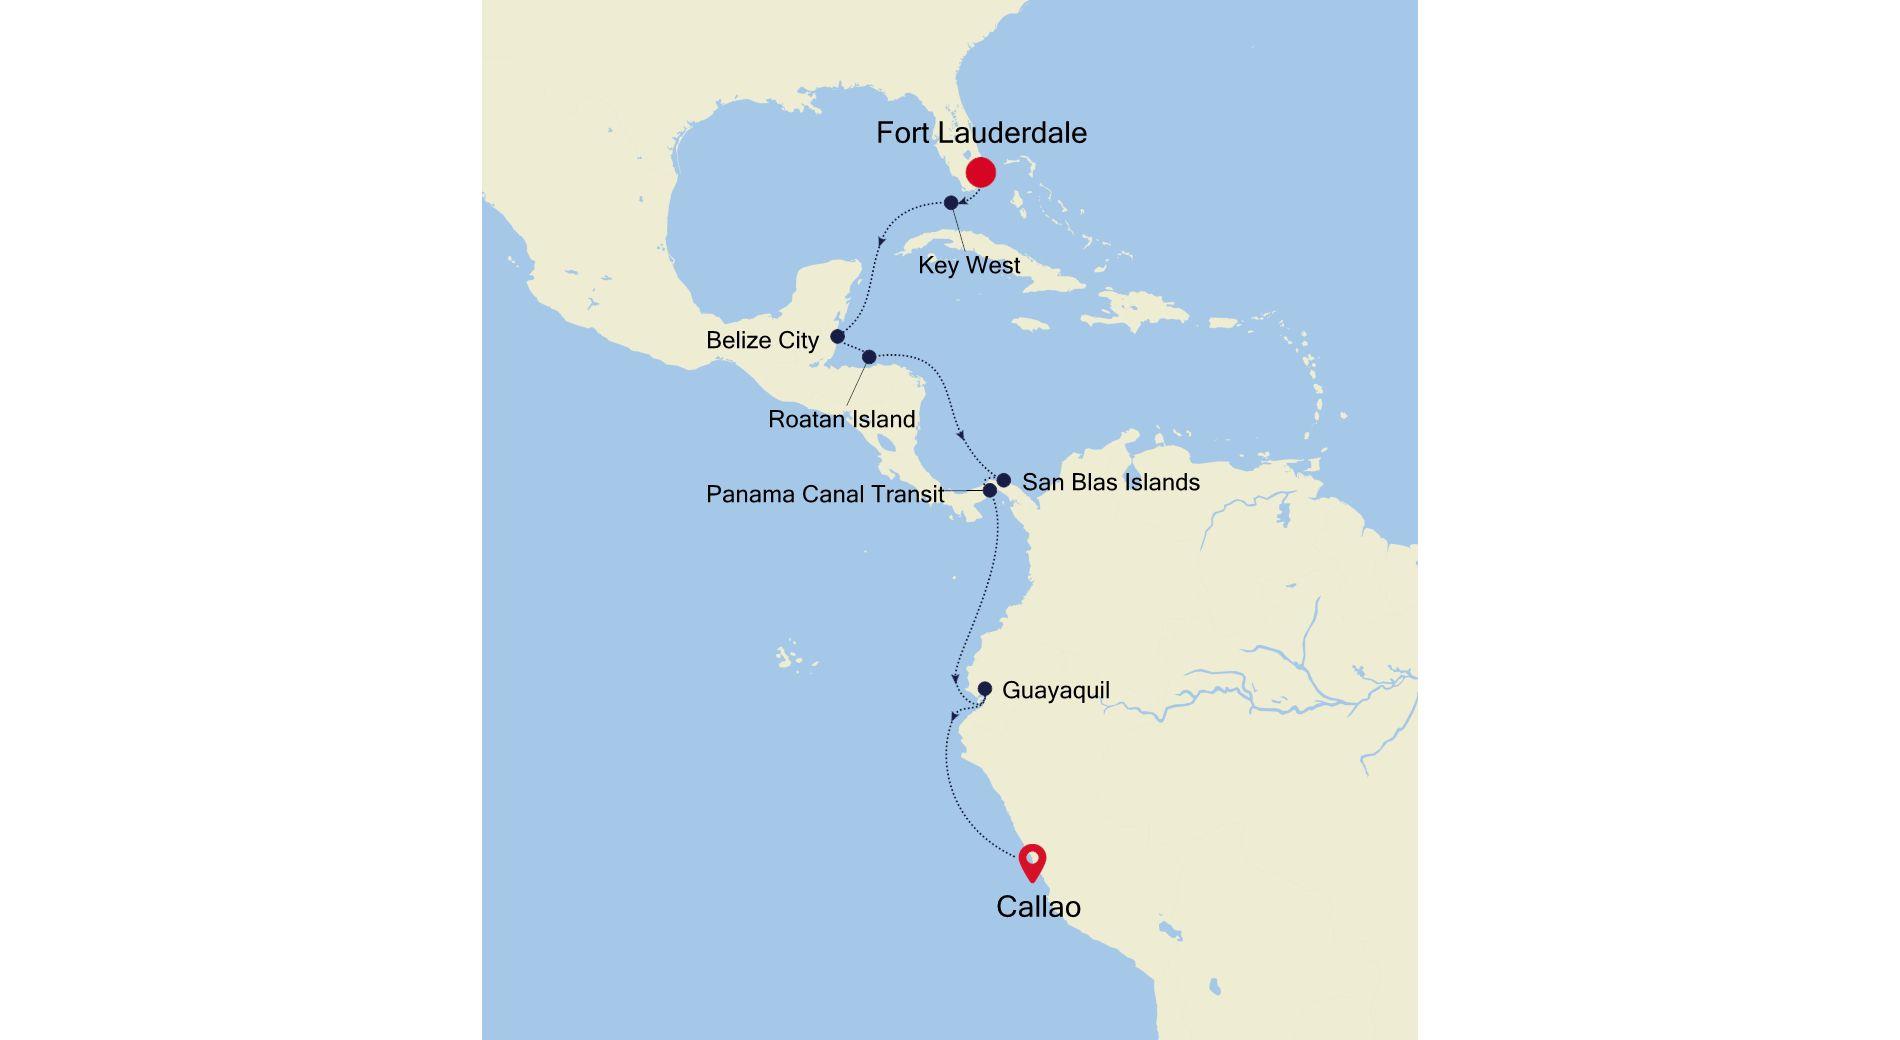 WH210107013 - Fort Lauderdale à Callao